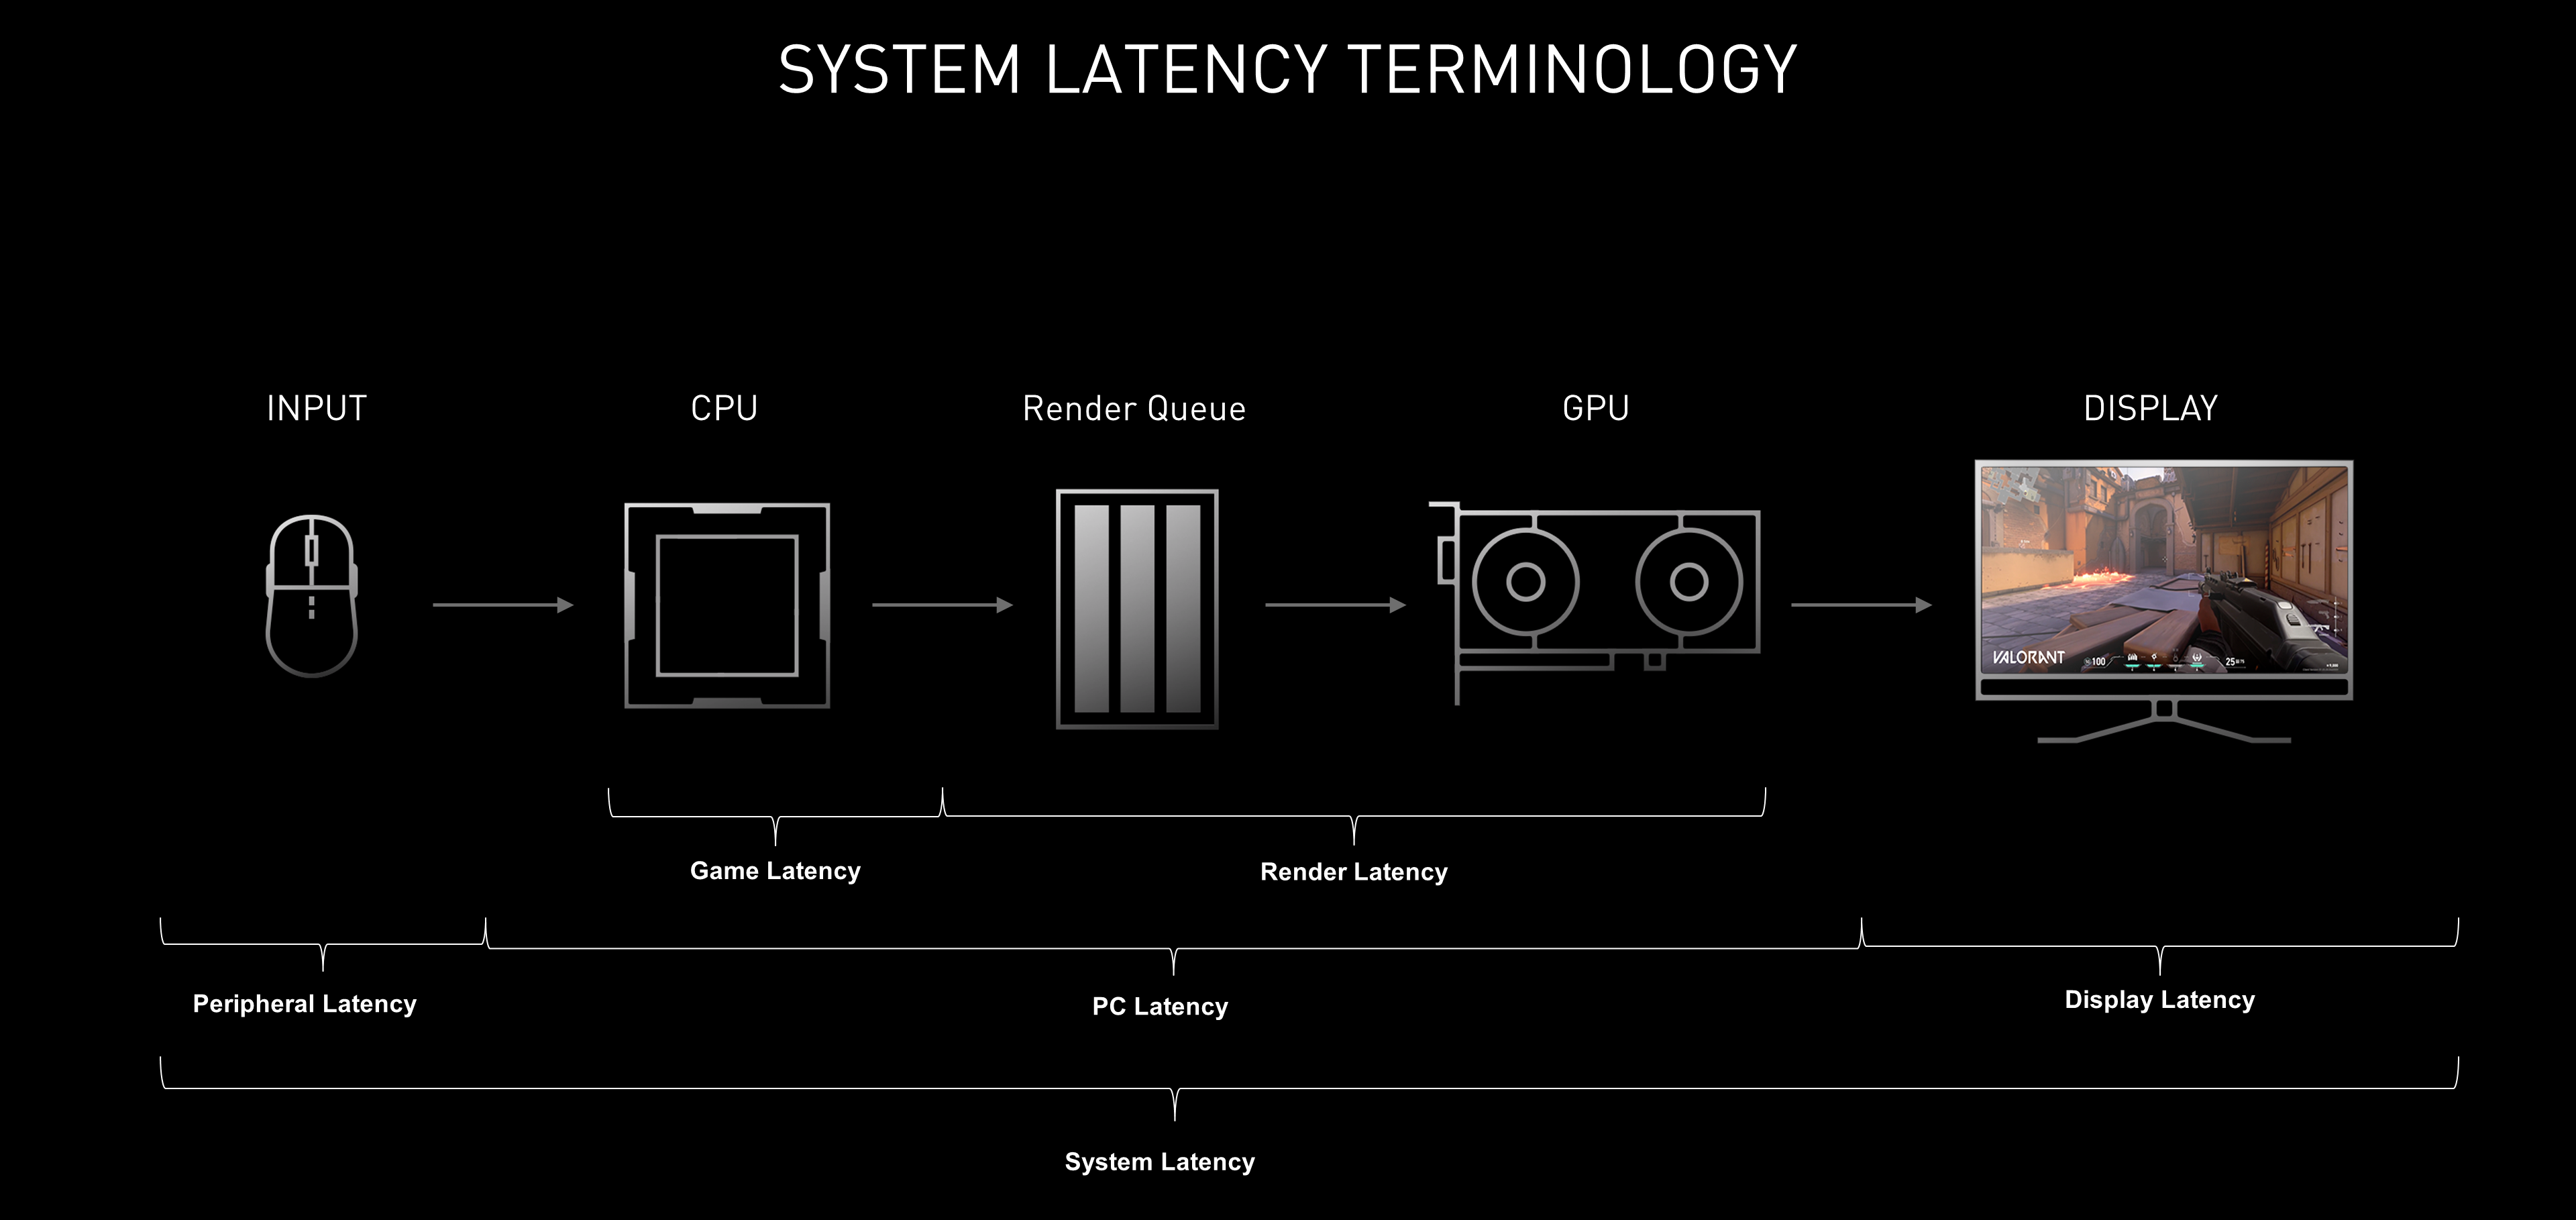 Sistema de latencia